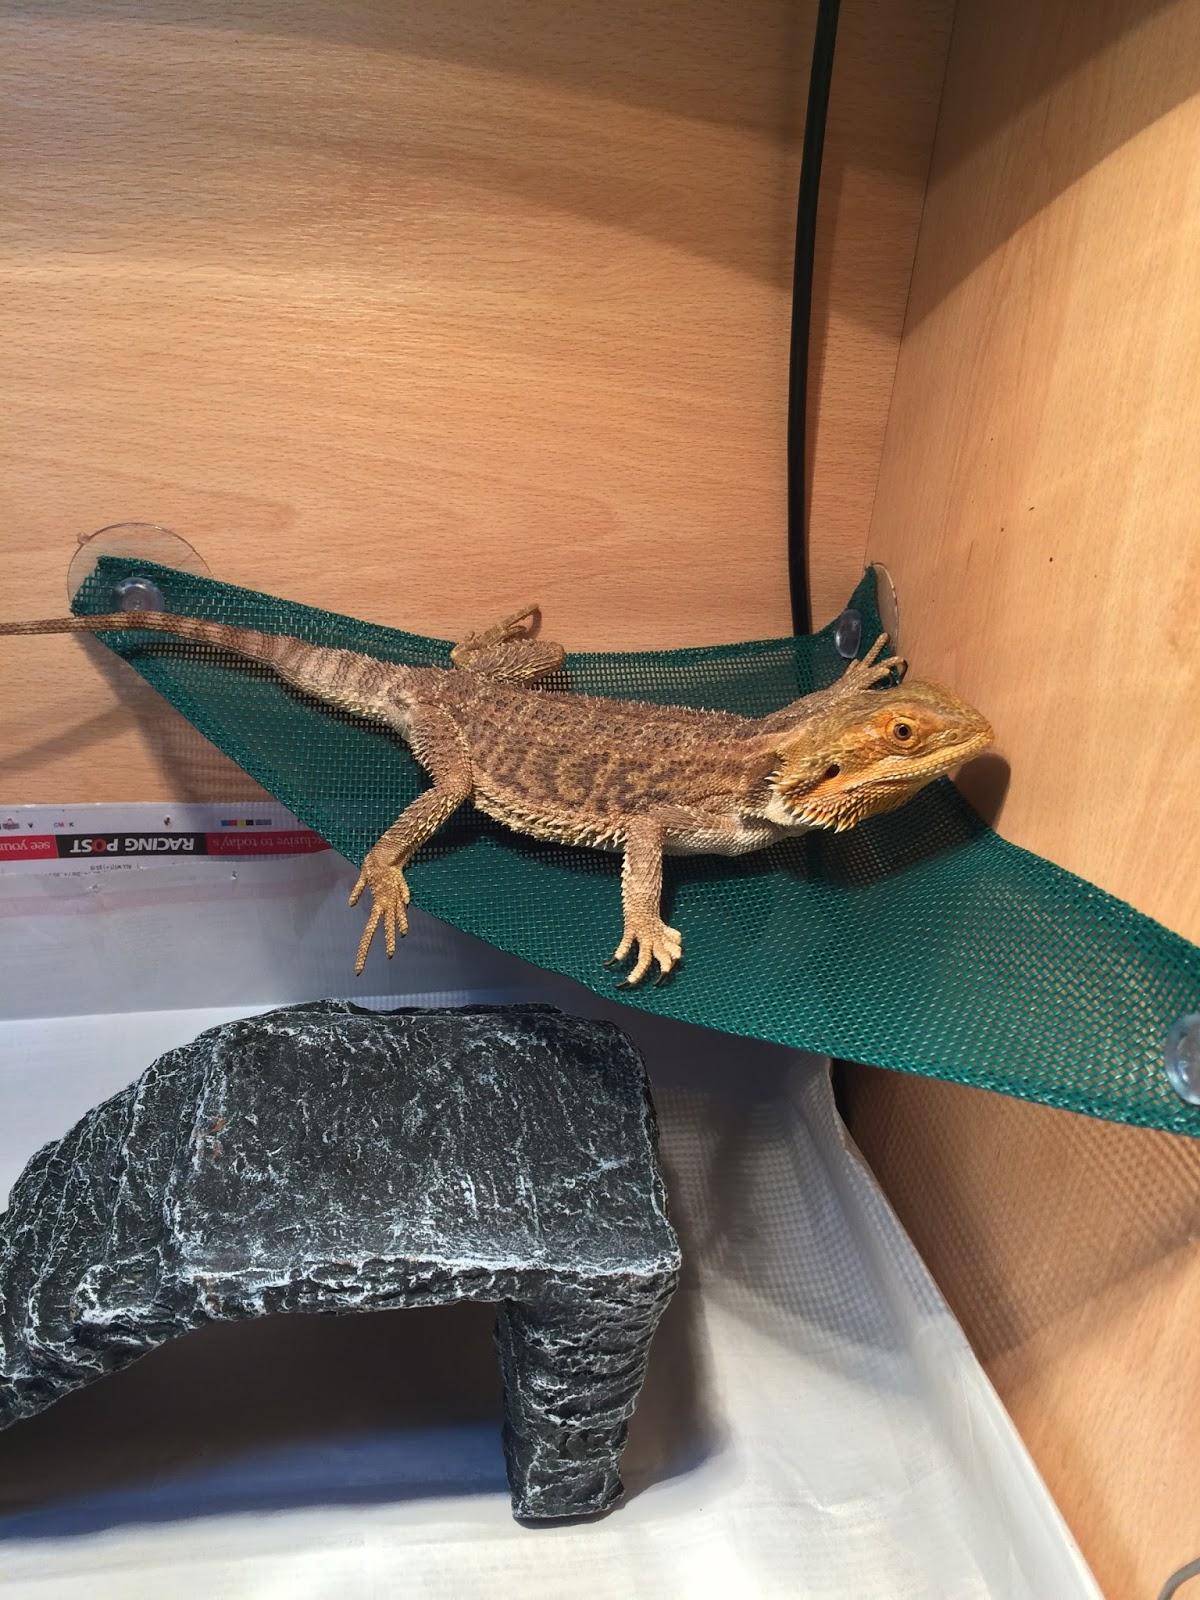 bearded dragon on a reptile hammock